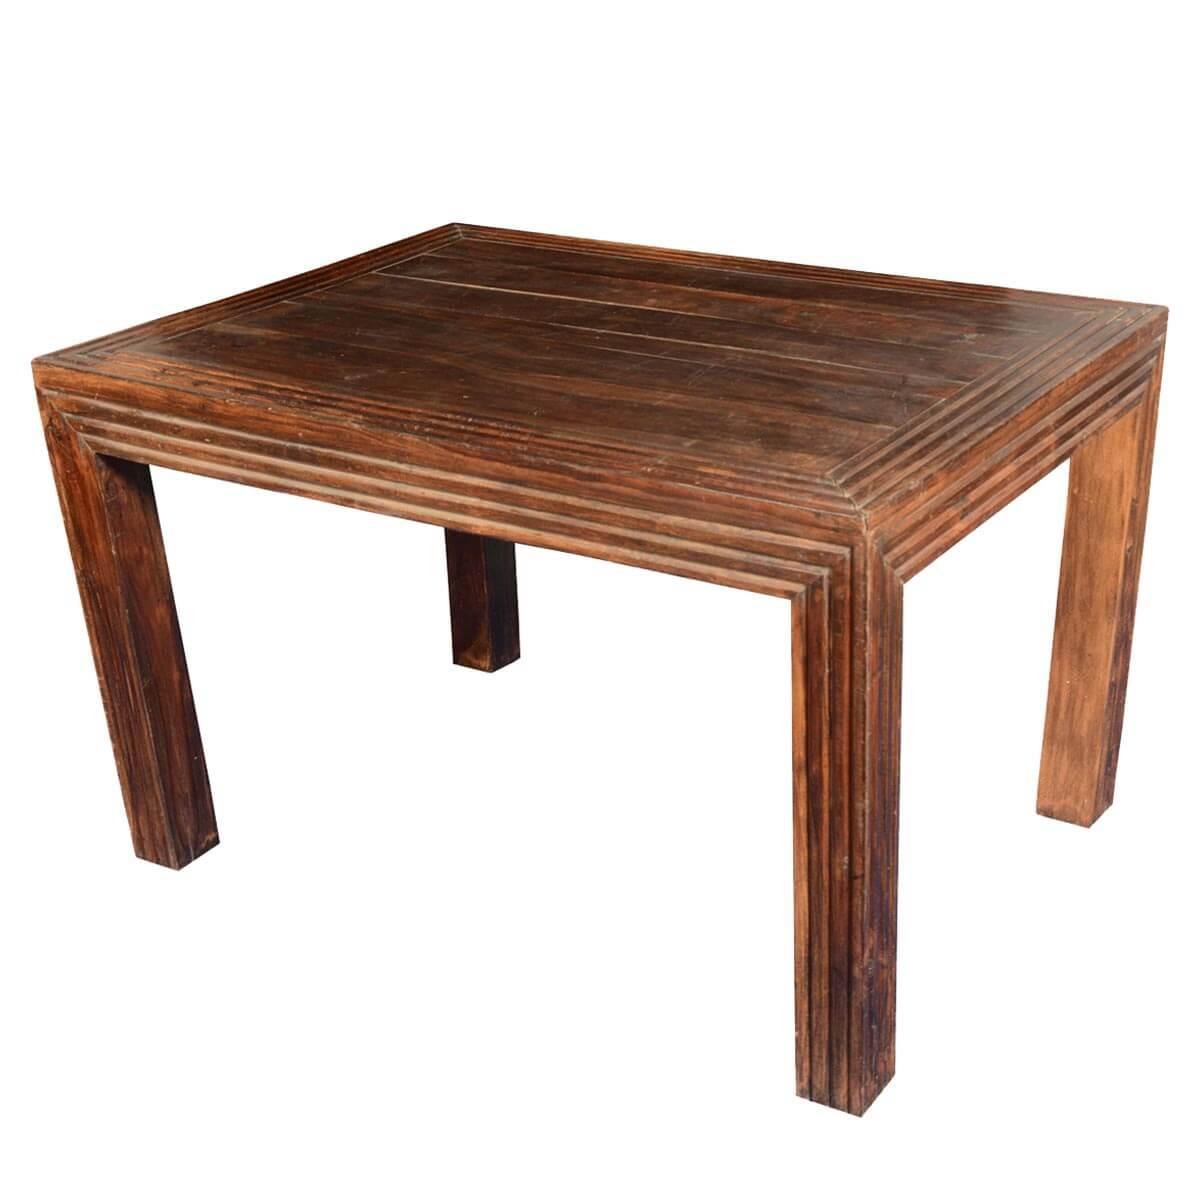 Sierra Rustic Handcrafted Mango Wood Dining Table